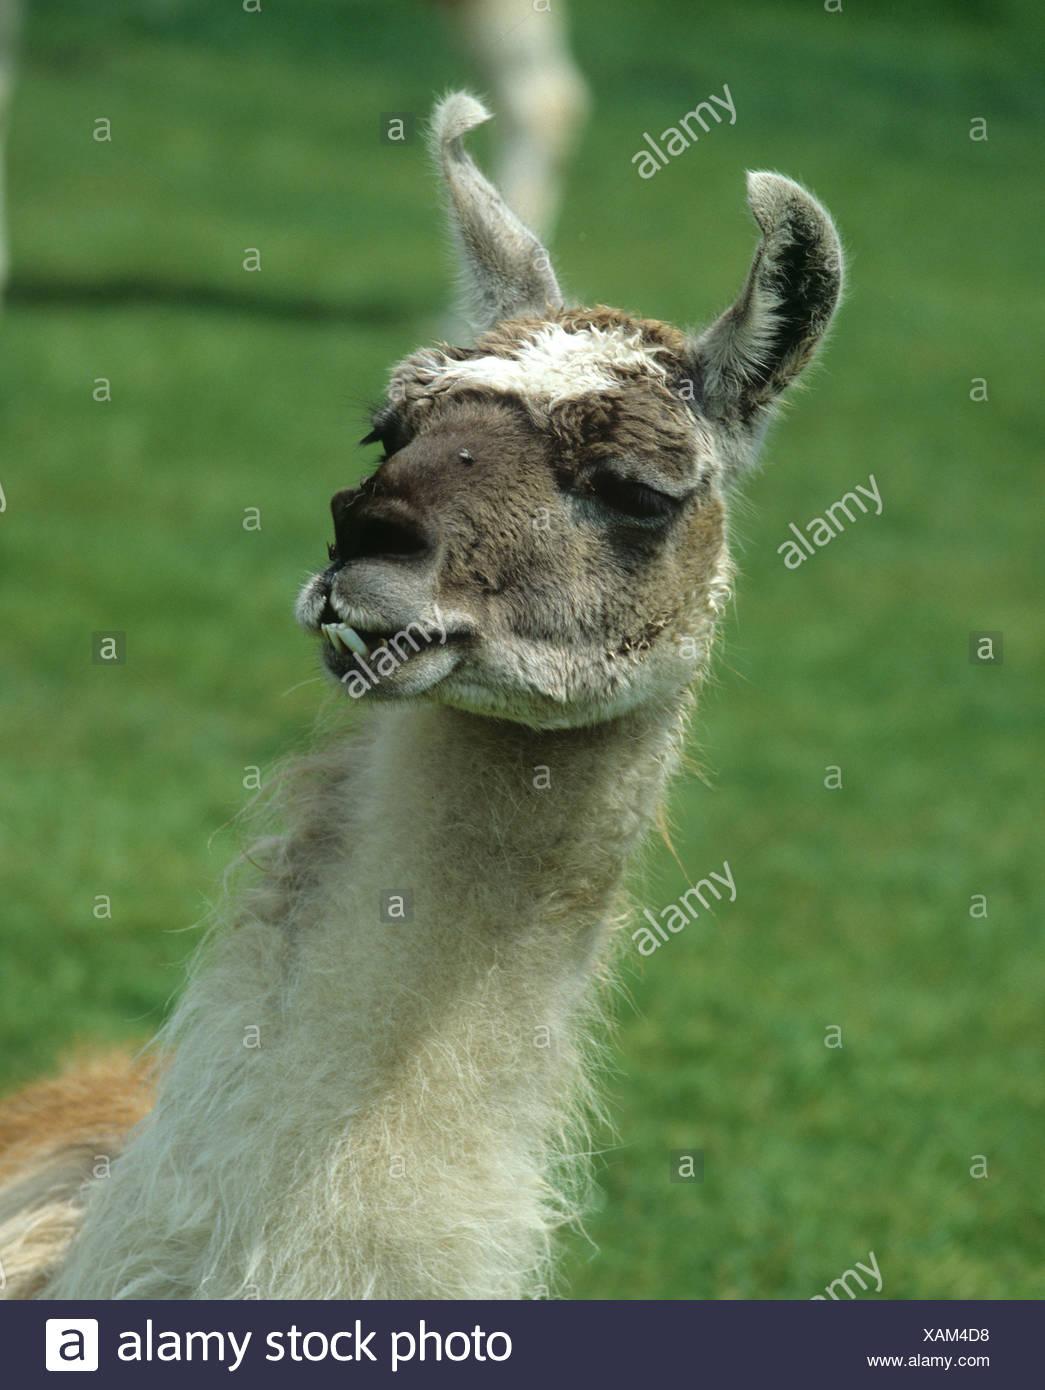 Elderley female llama with protruding lower teeth Sussex - Stock Image